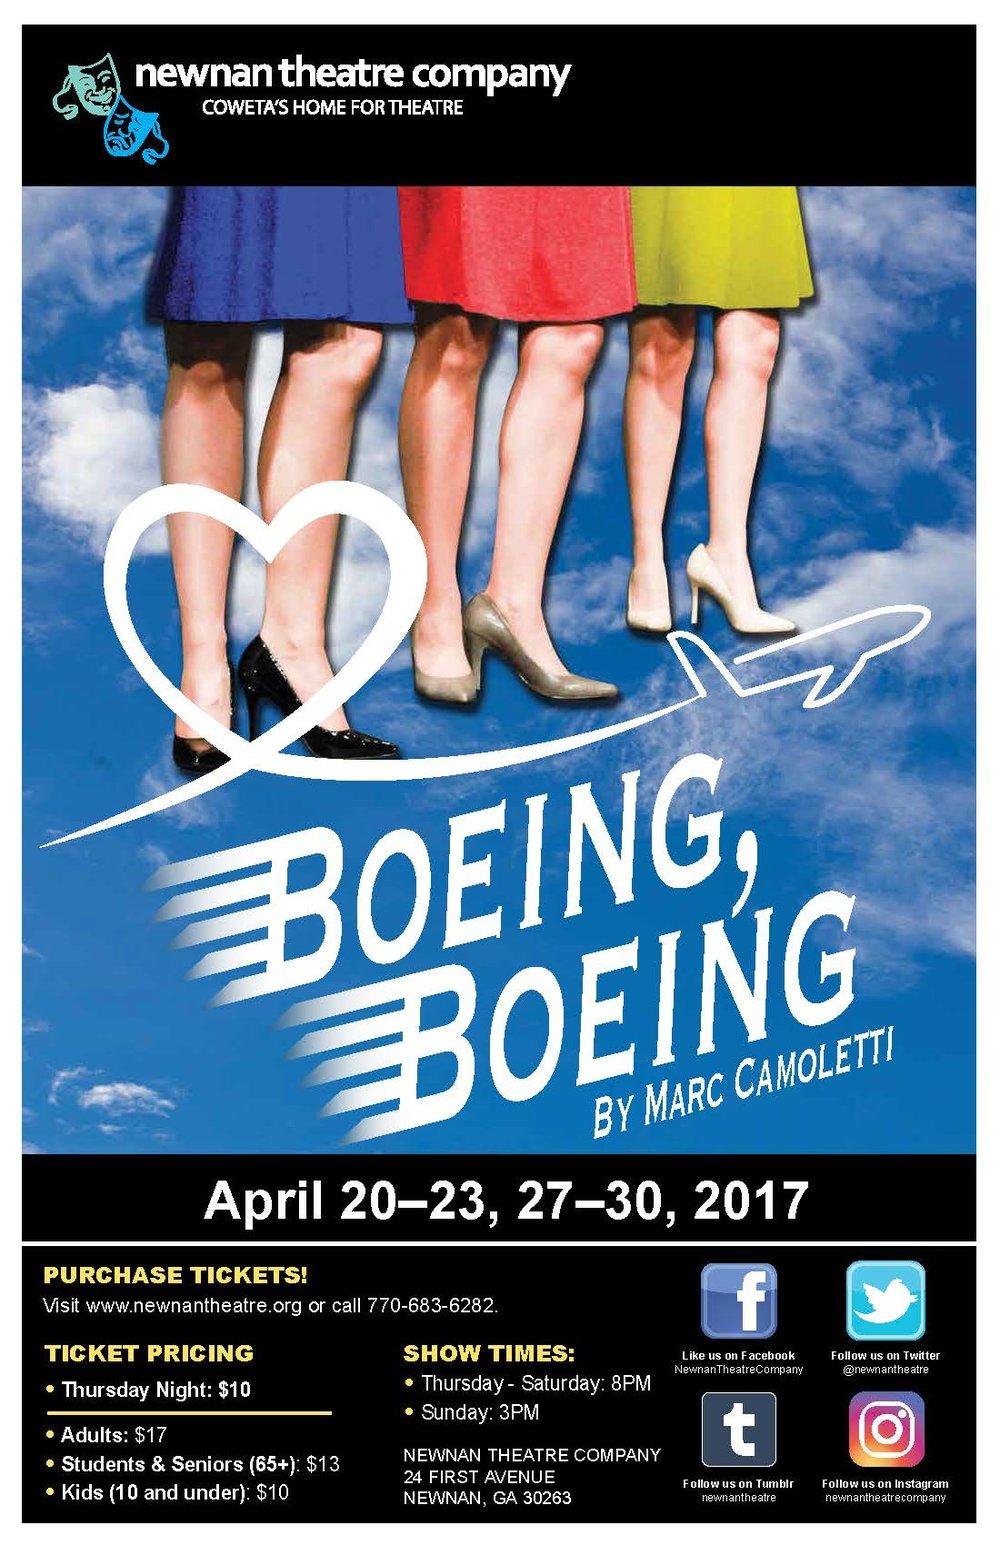 Boeing Boeing poster 11x17.jpg